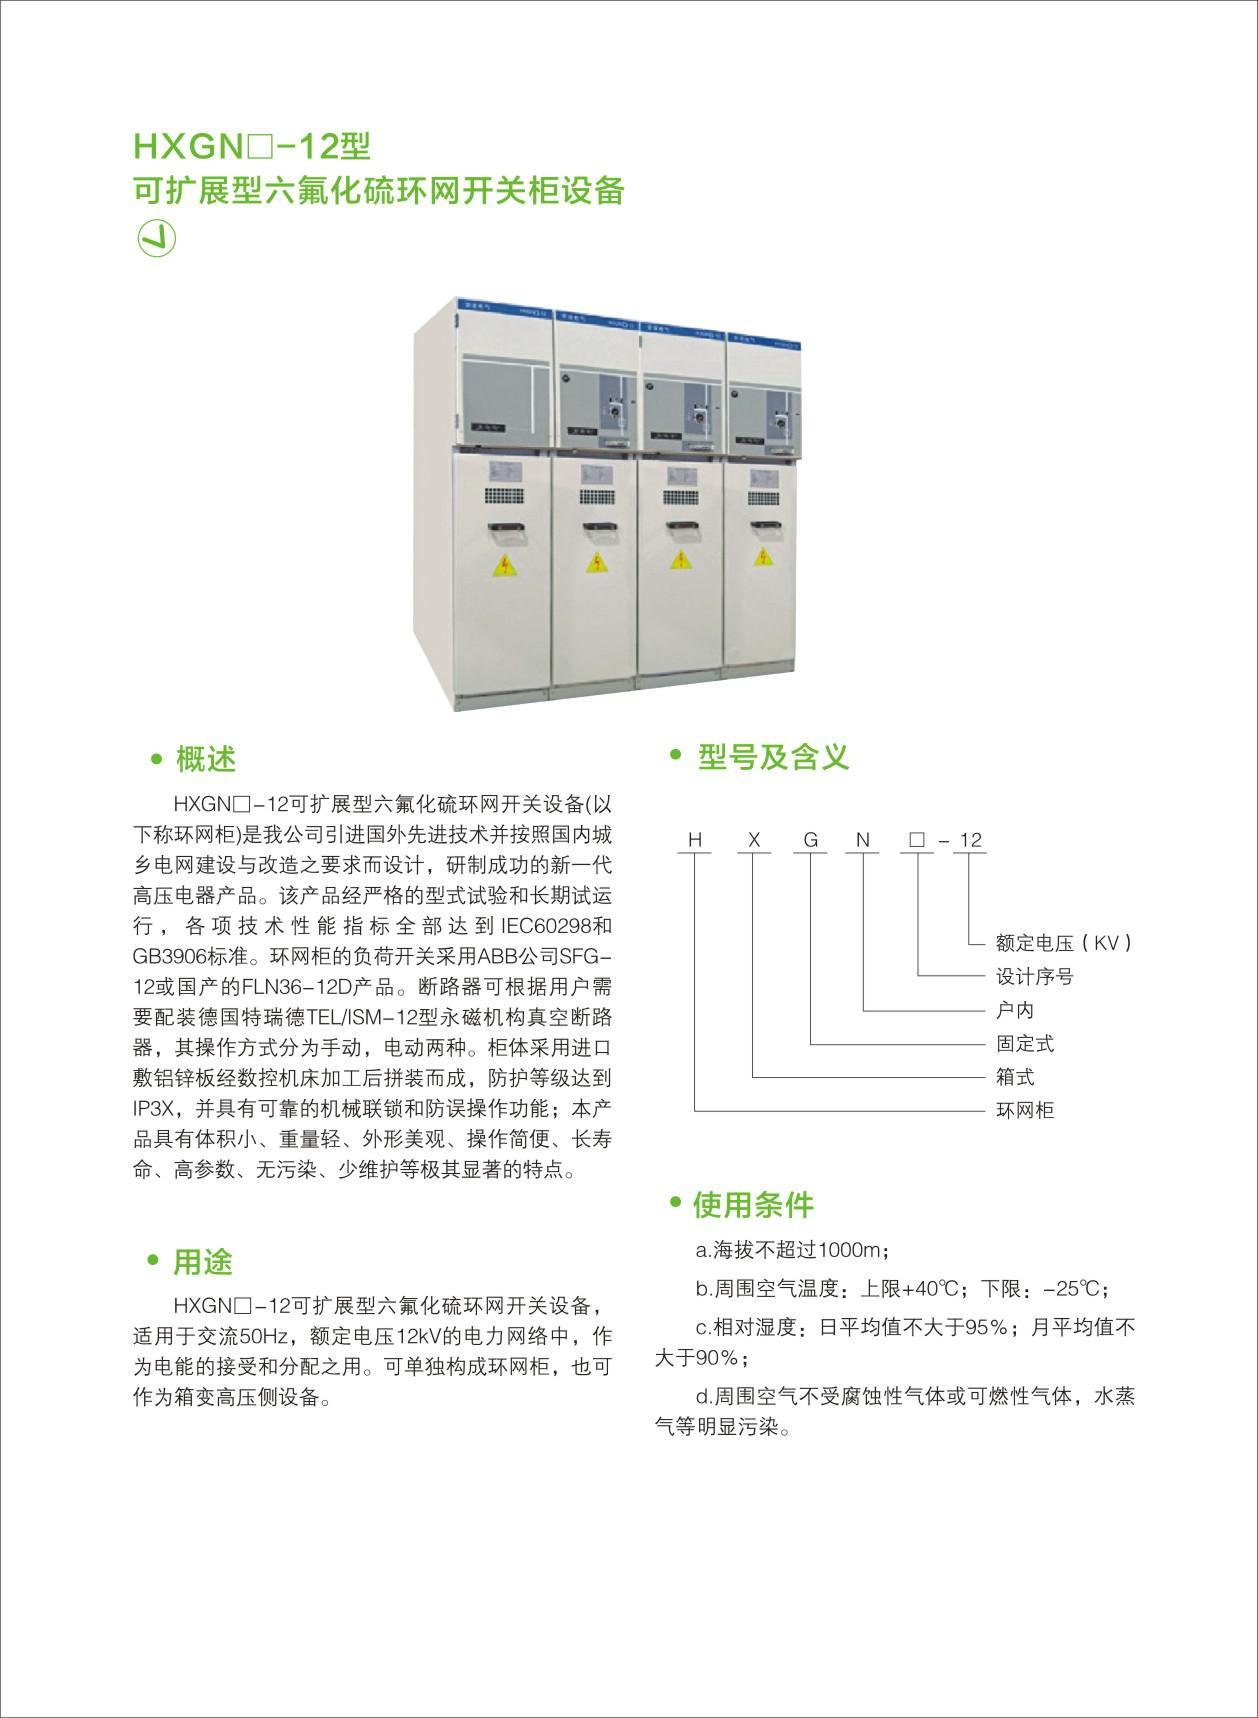 HXGN□-12型可擴展型六氟化硫環網開關柜設備-01